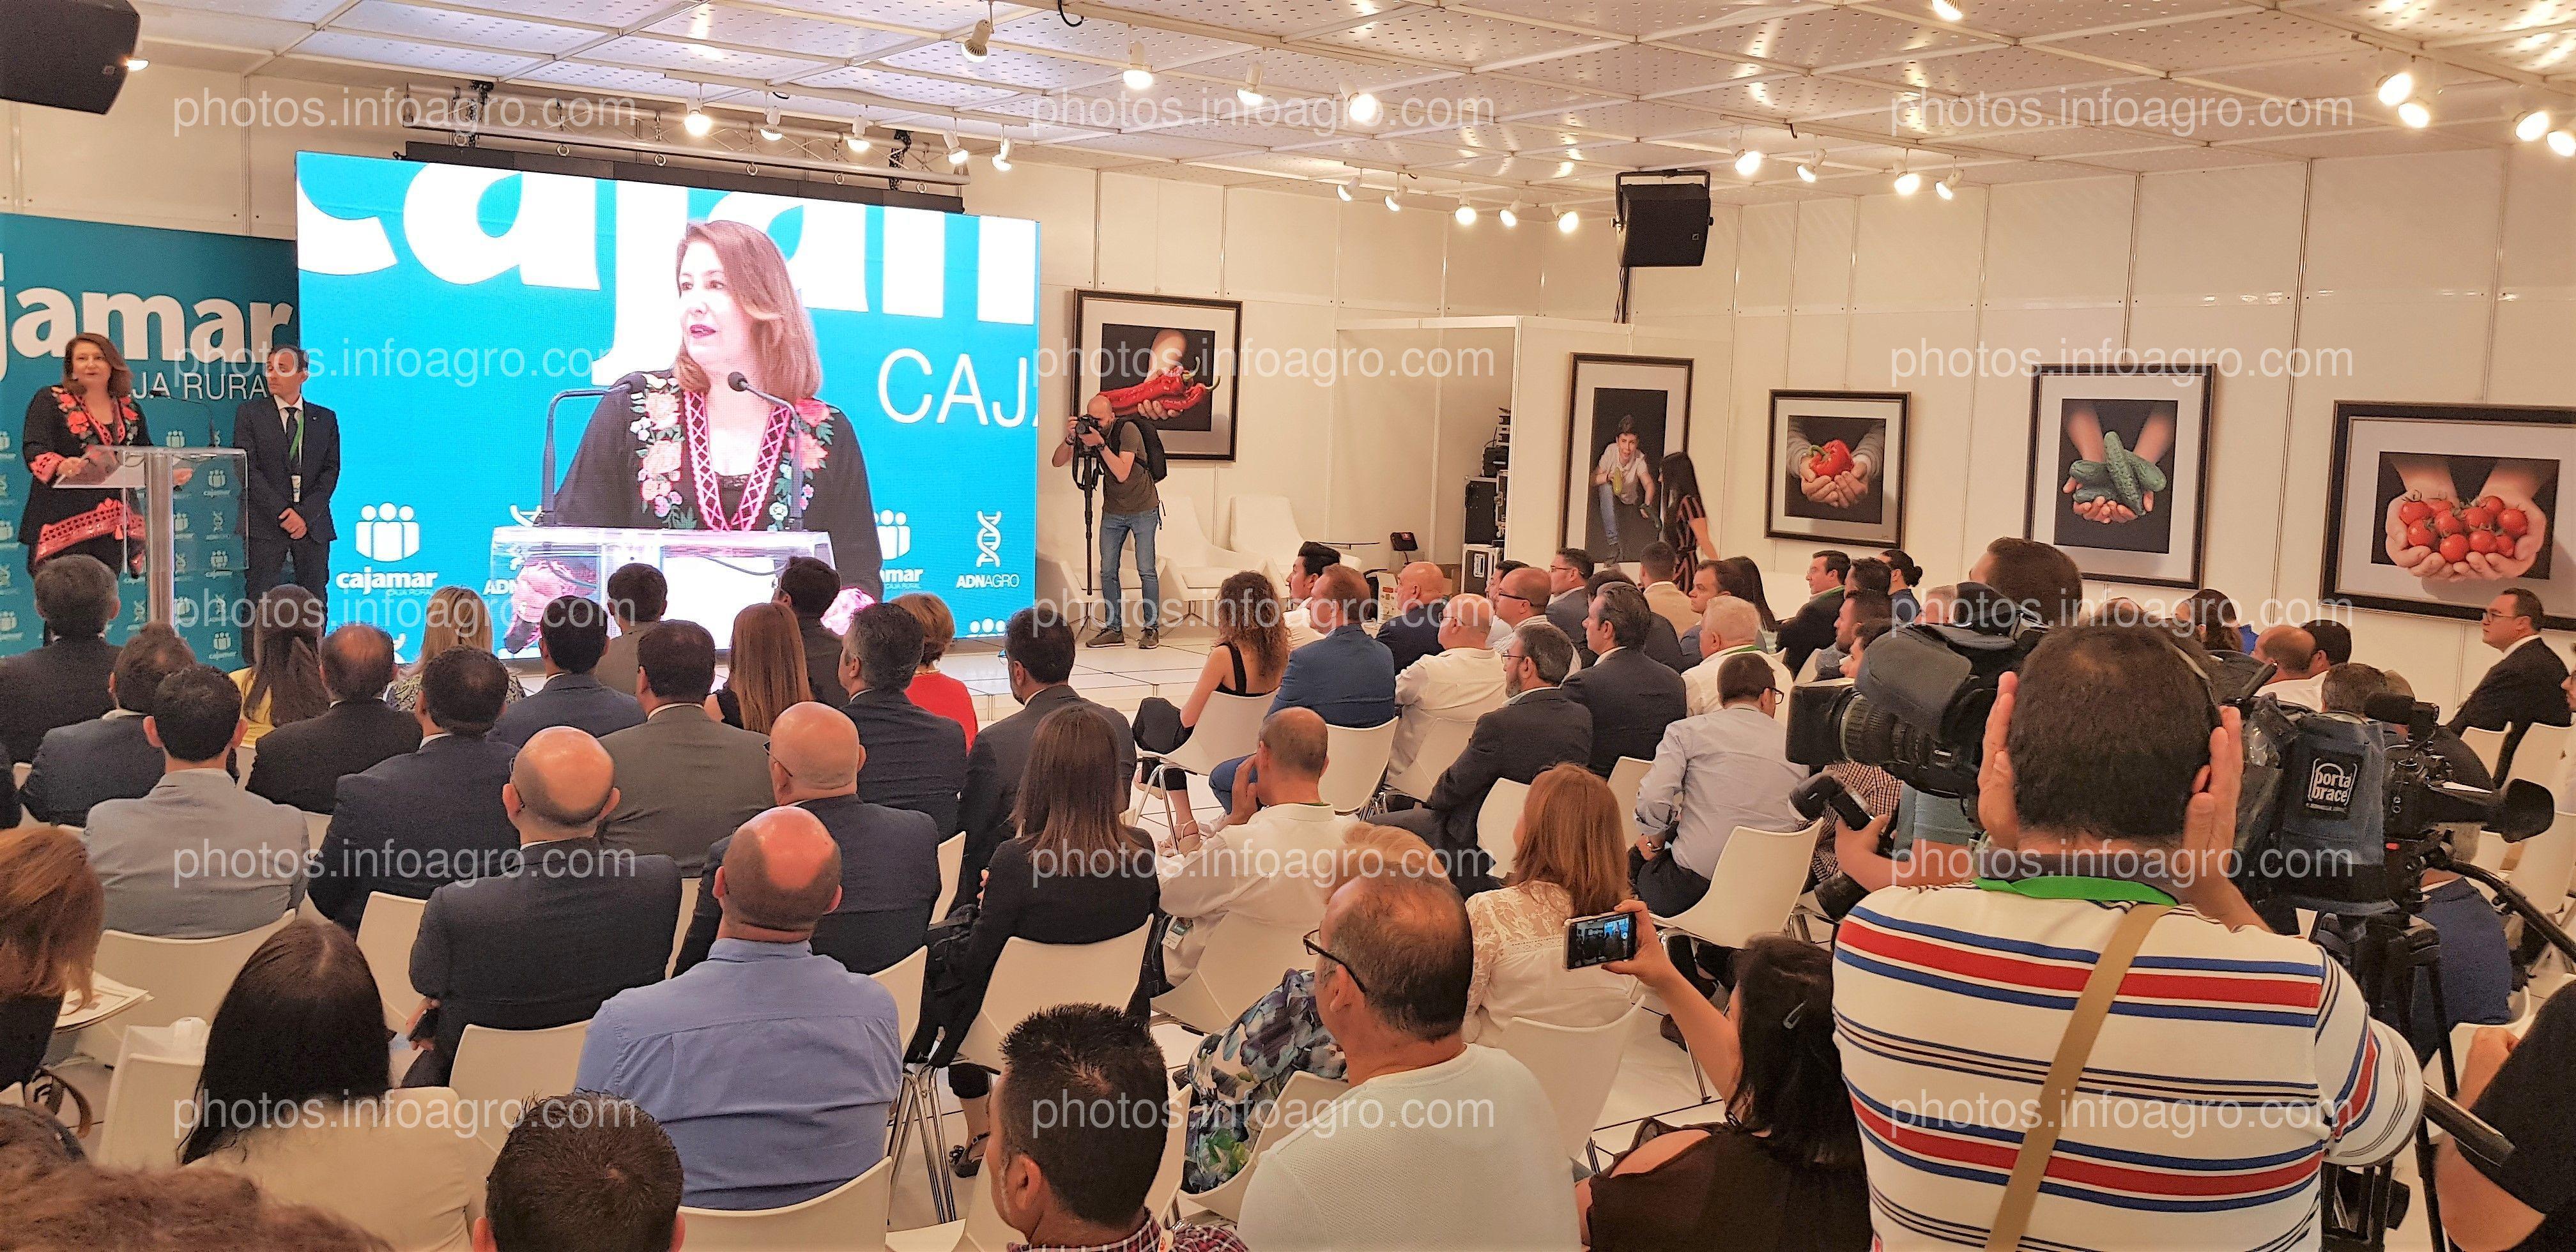 Premios Infoagro Exhibition 2019